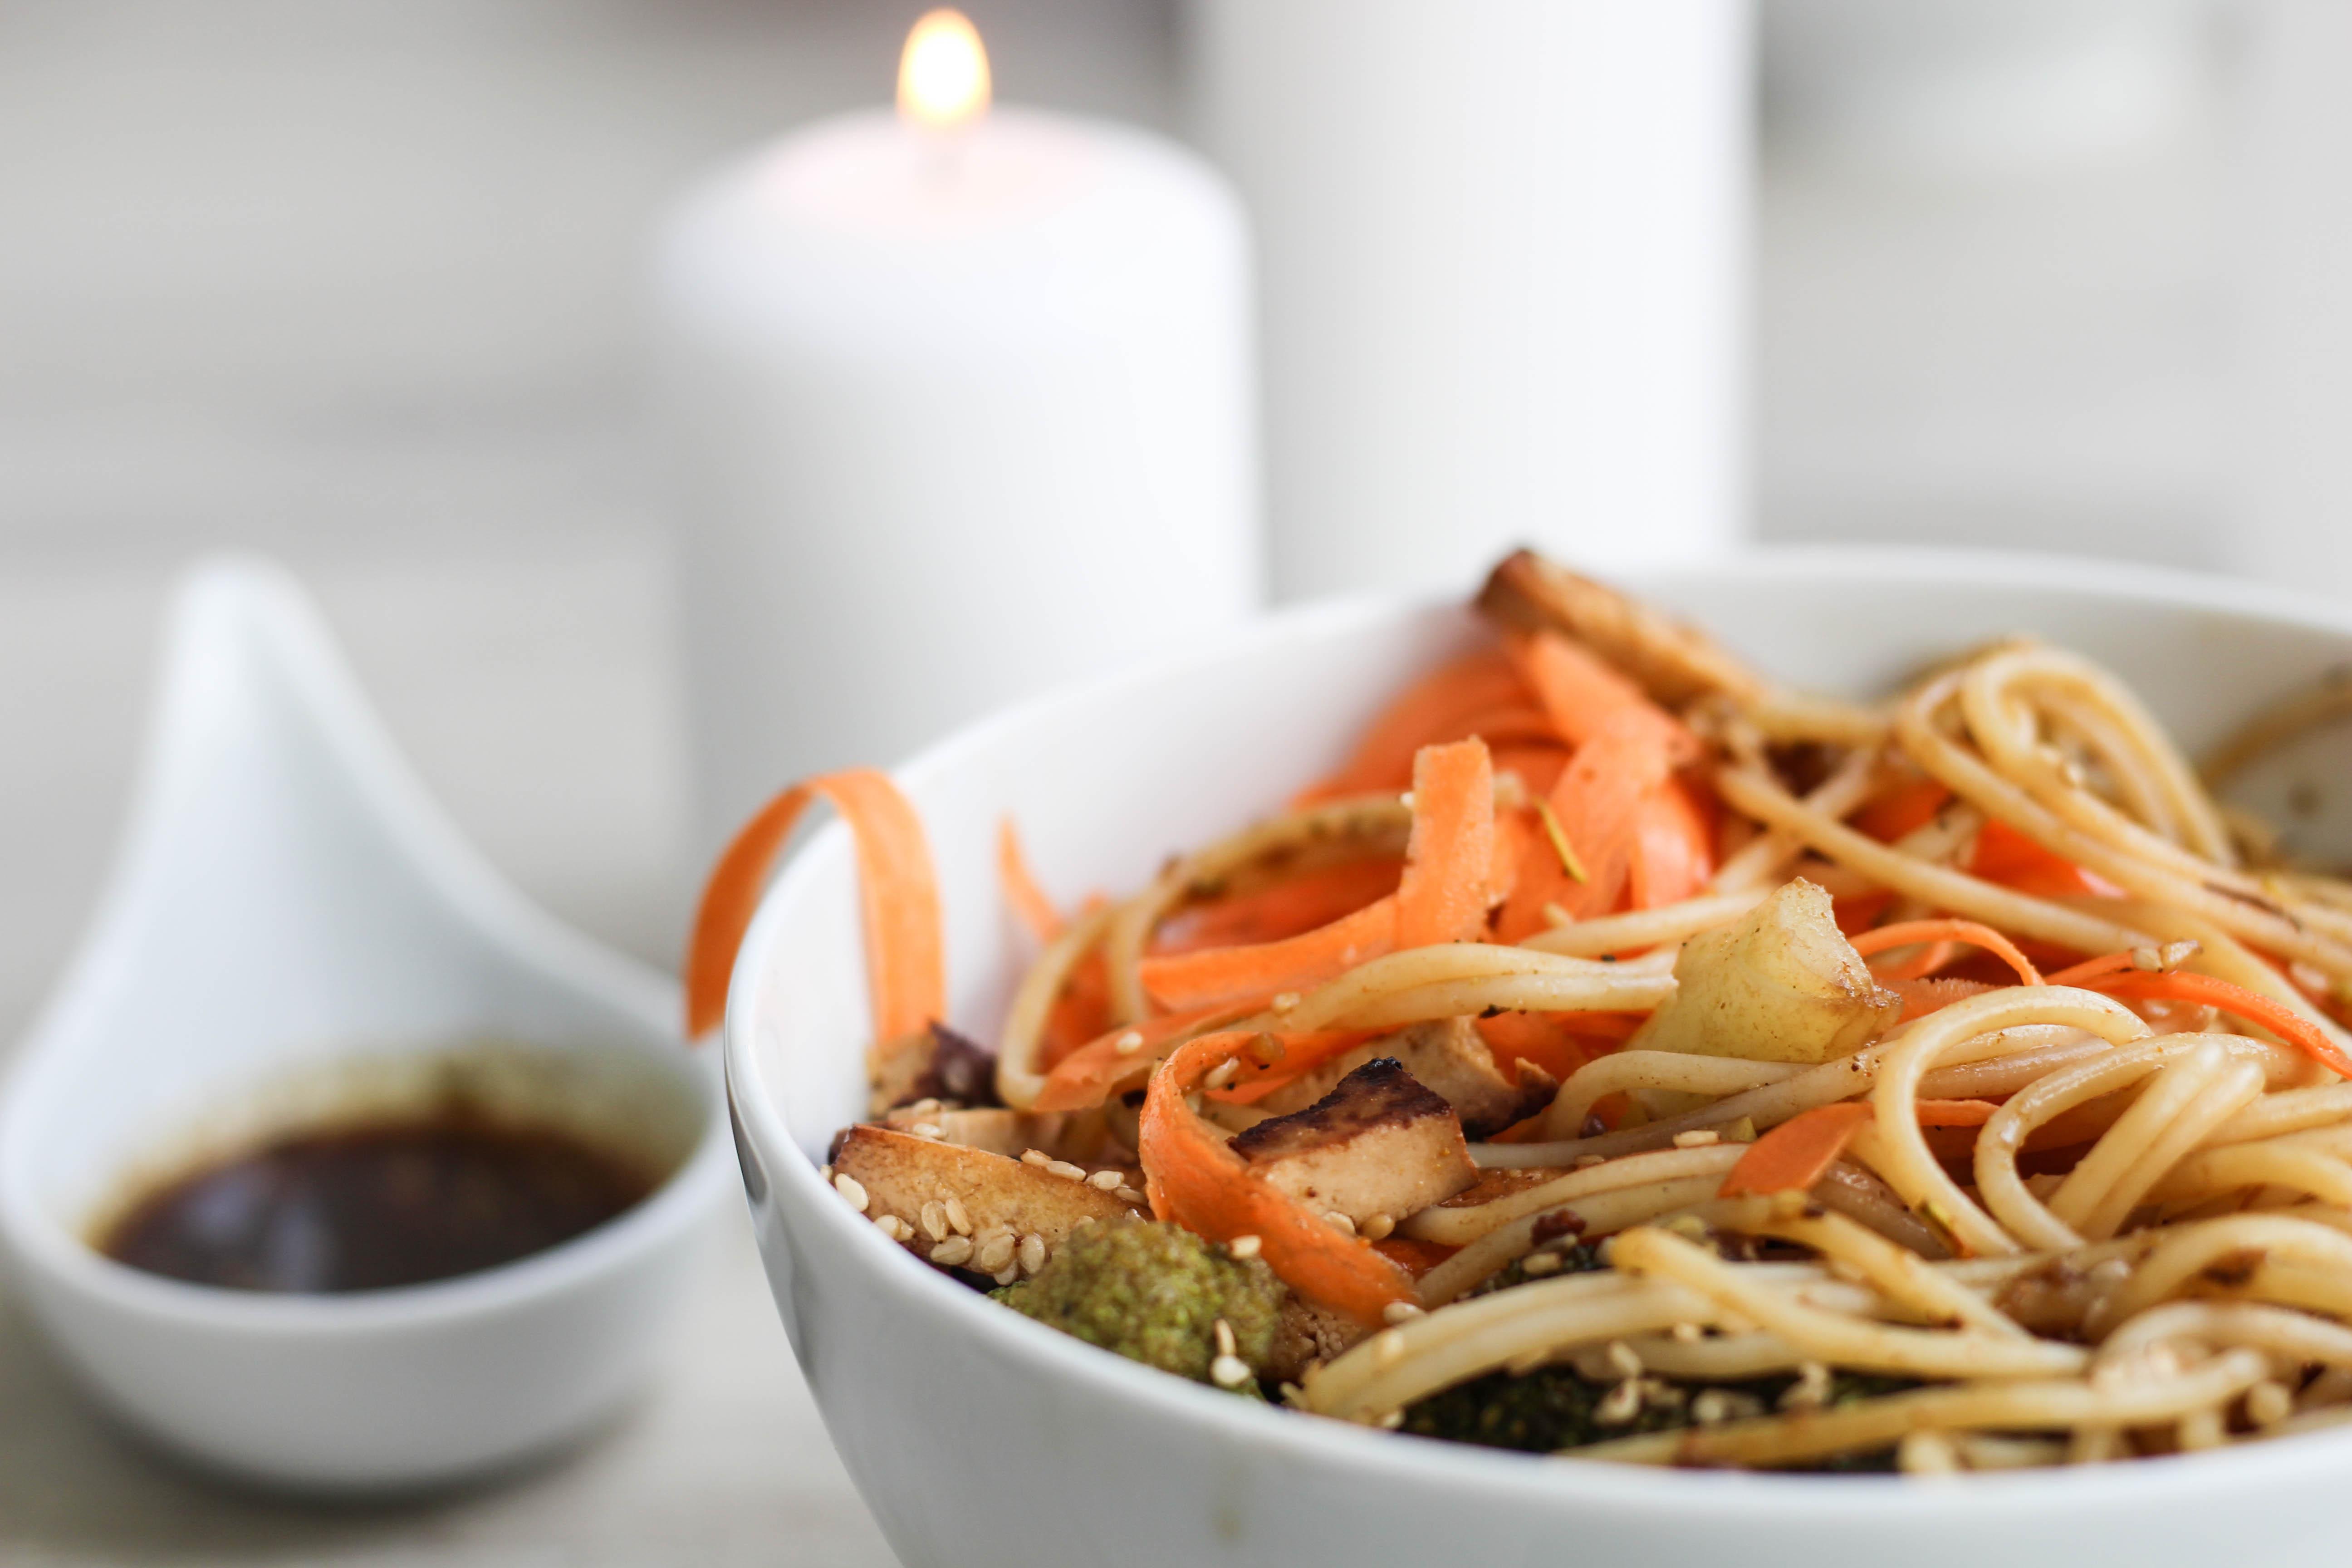 bowl-vegan-tofu-spices-shabby-knoblauch-kochen-healthyfood-1-von-1